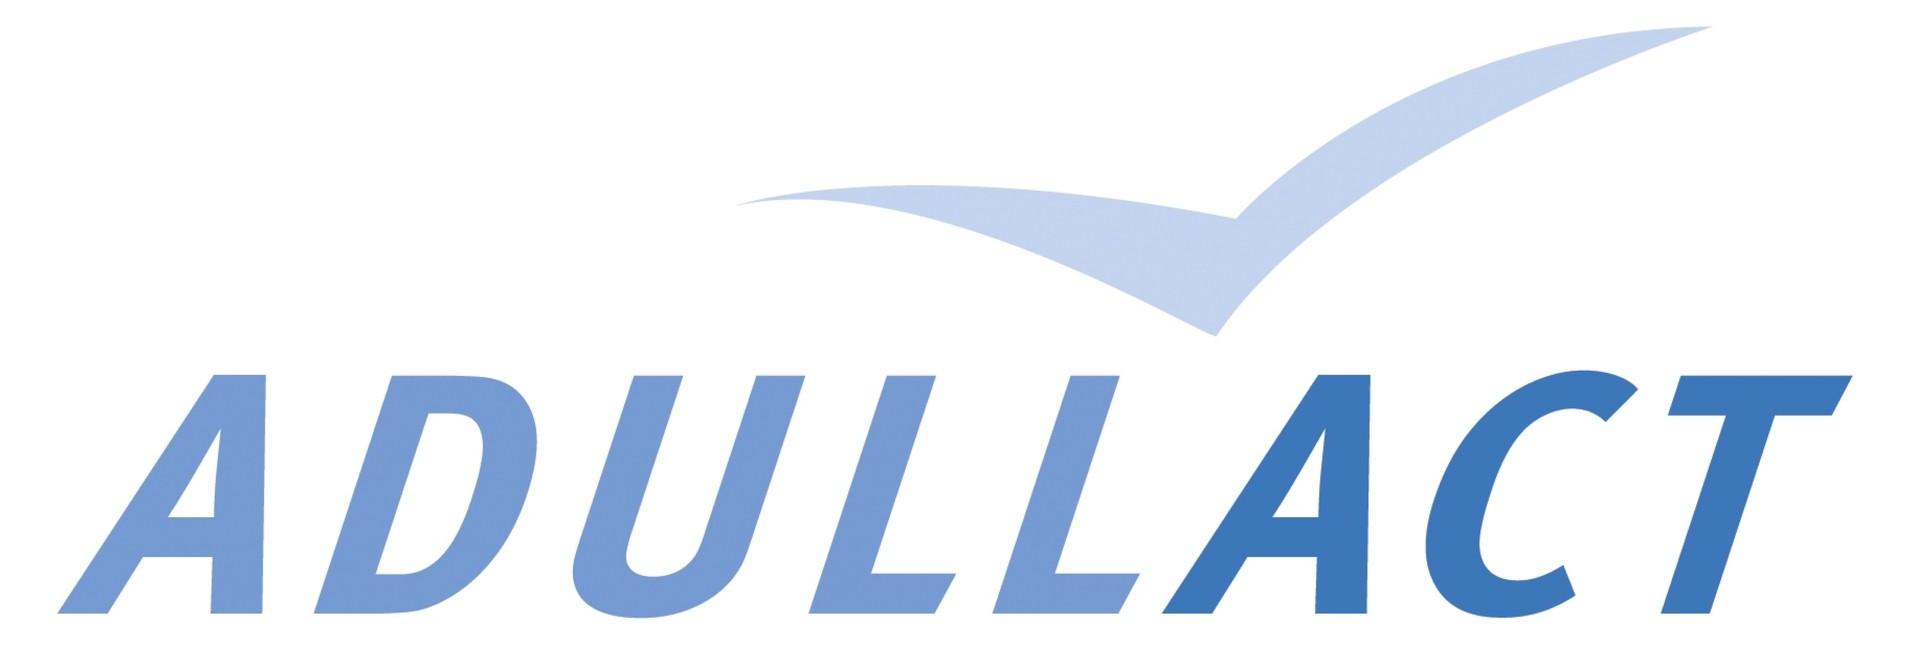 media/adullact/logo_adullact.jpg